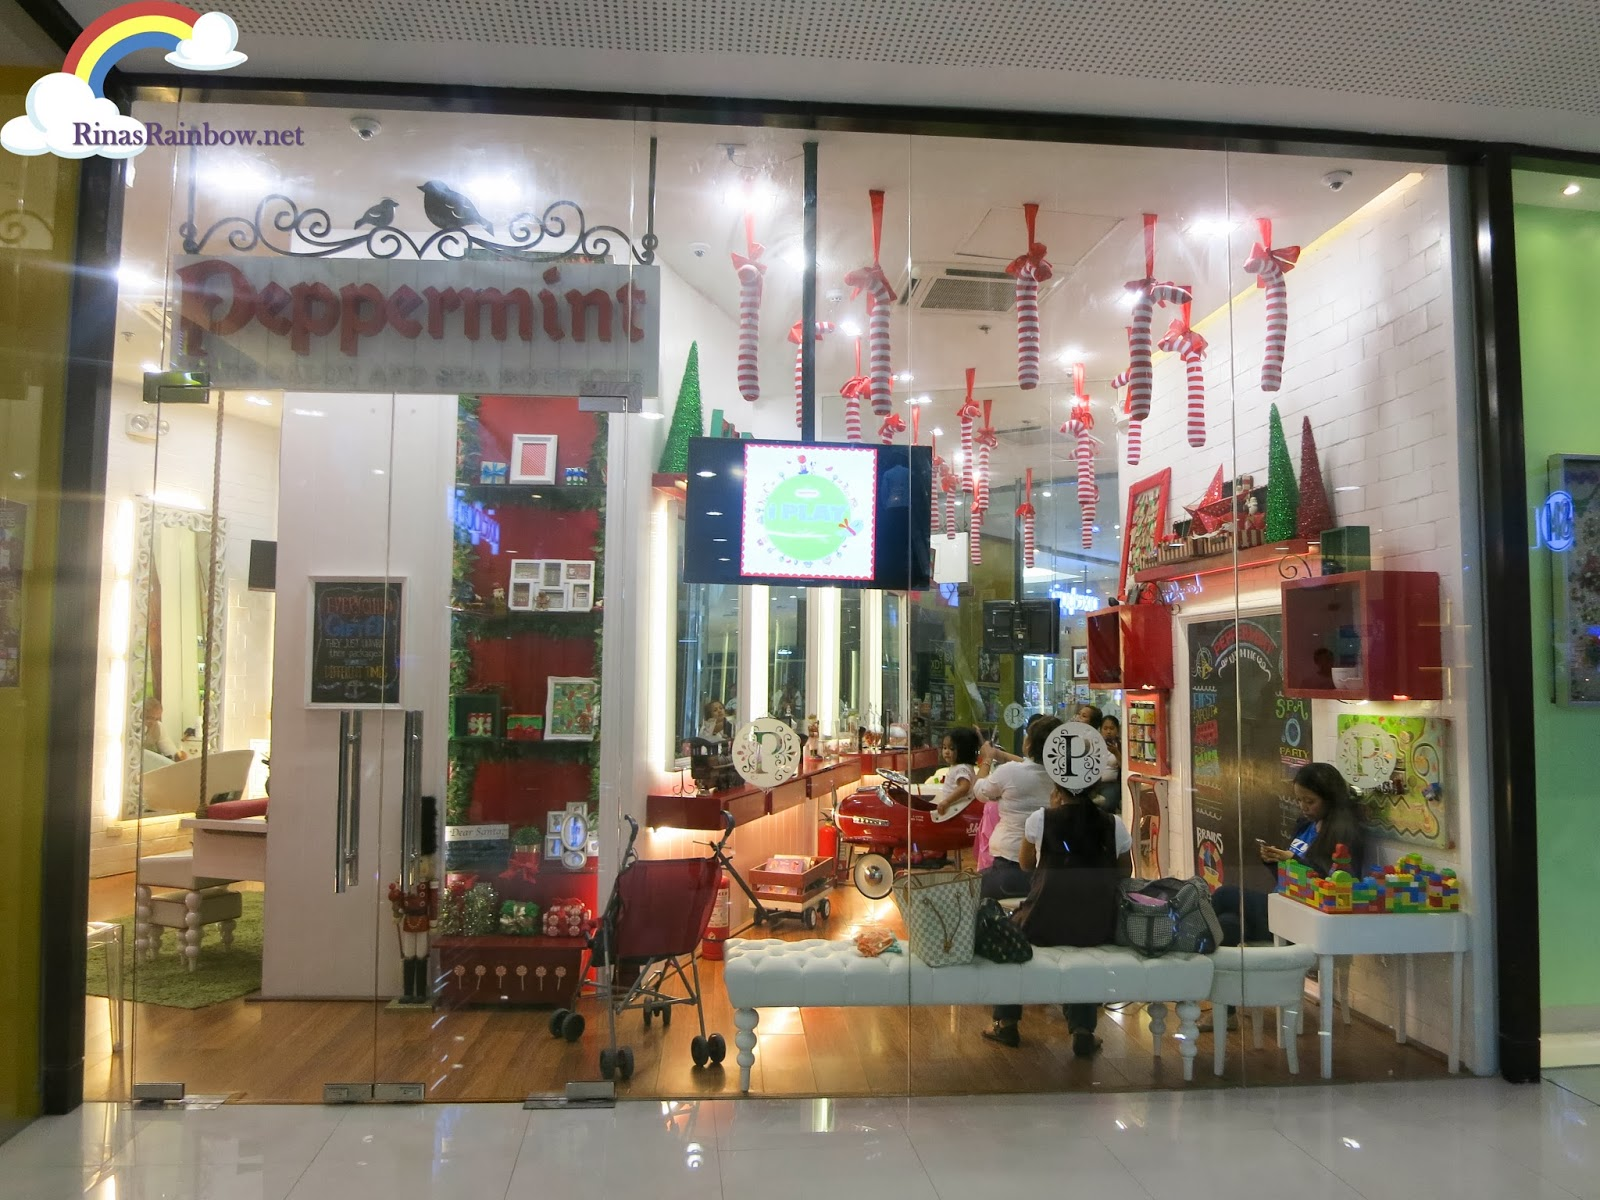 rina 39 s rainbow peppermint a dainty vintage kids salon. Black Bedroom Furniture Sets. Home Design Ideas